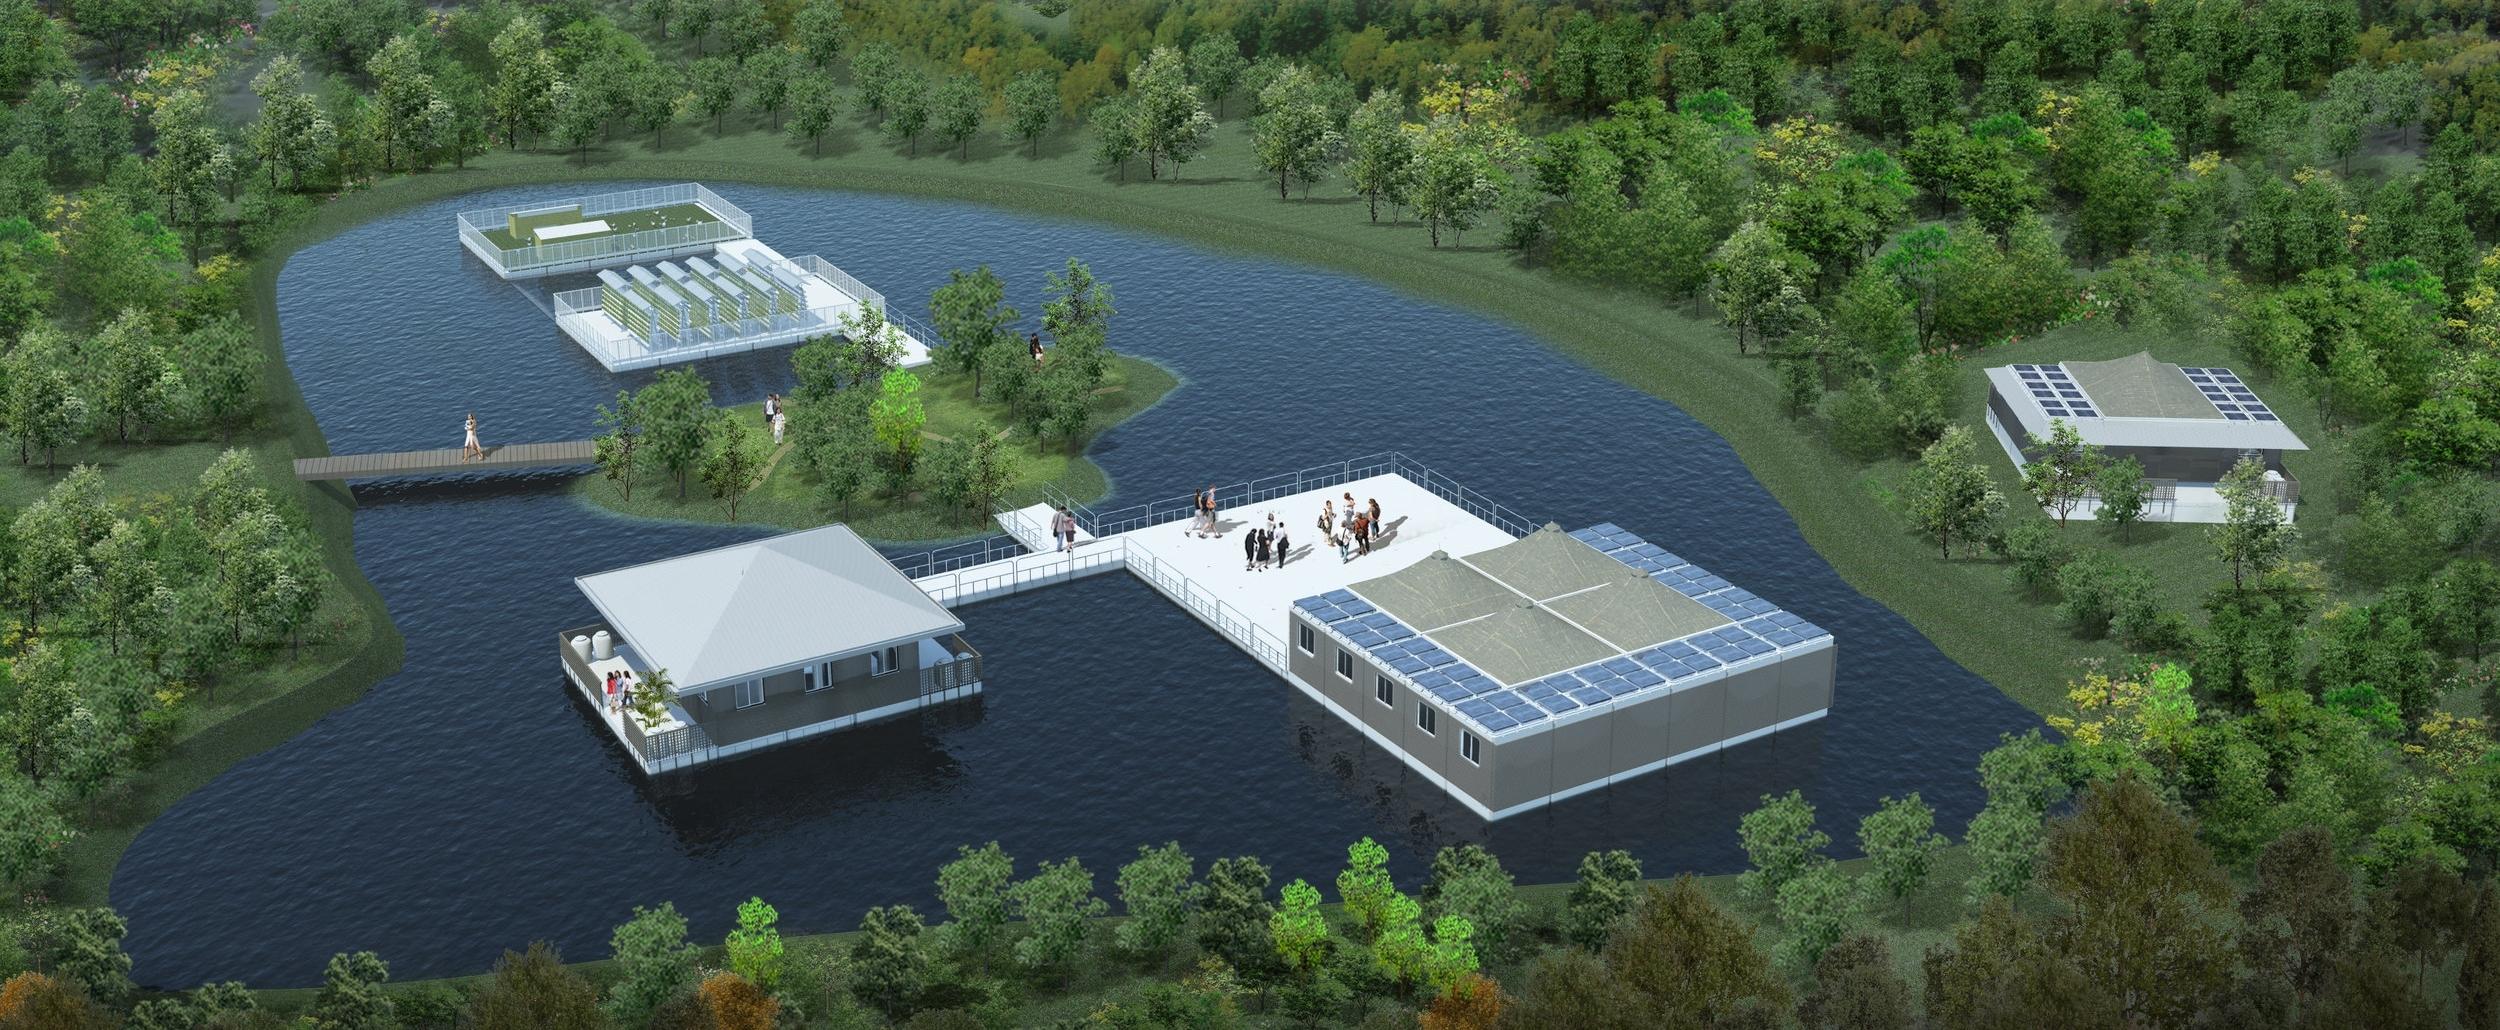 lifeark-prototype-floating-community